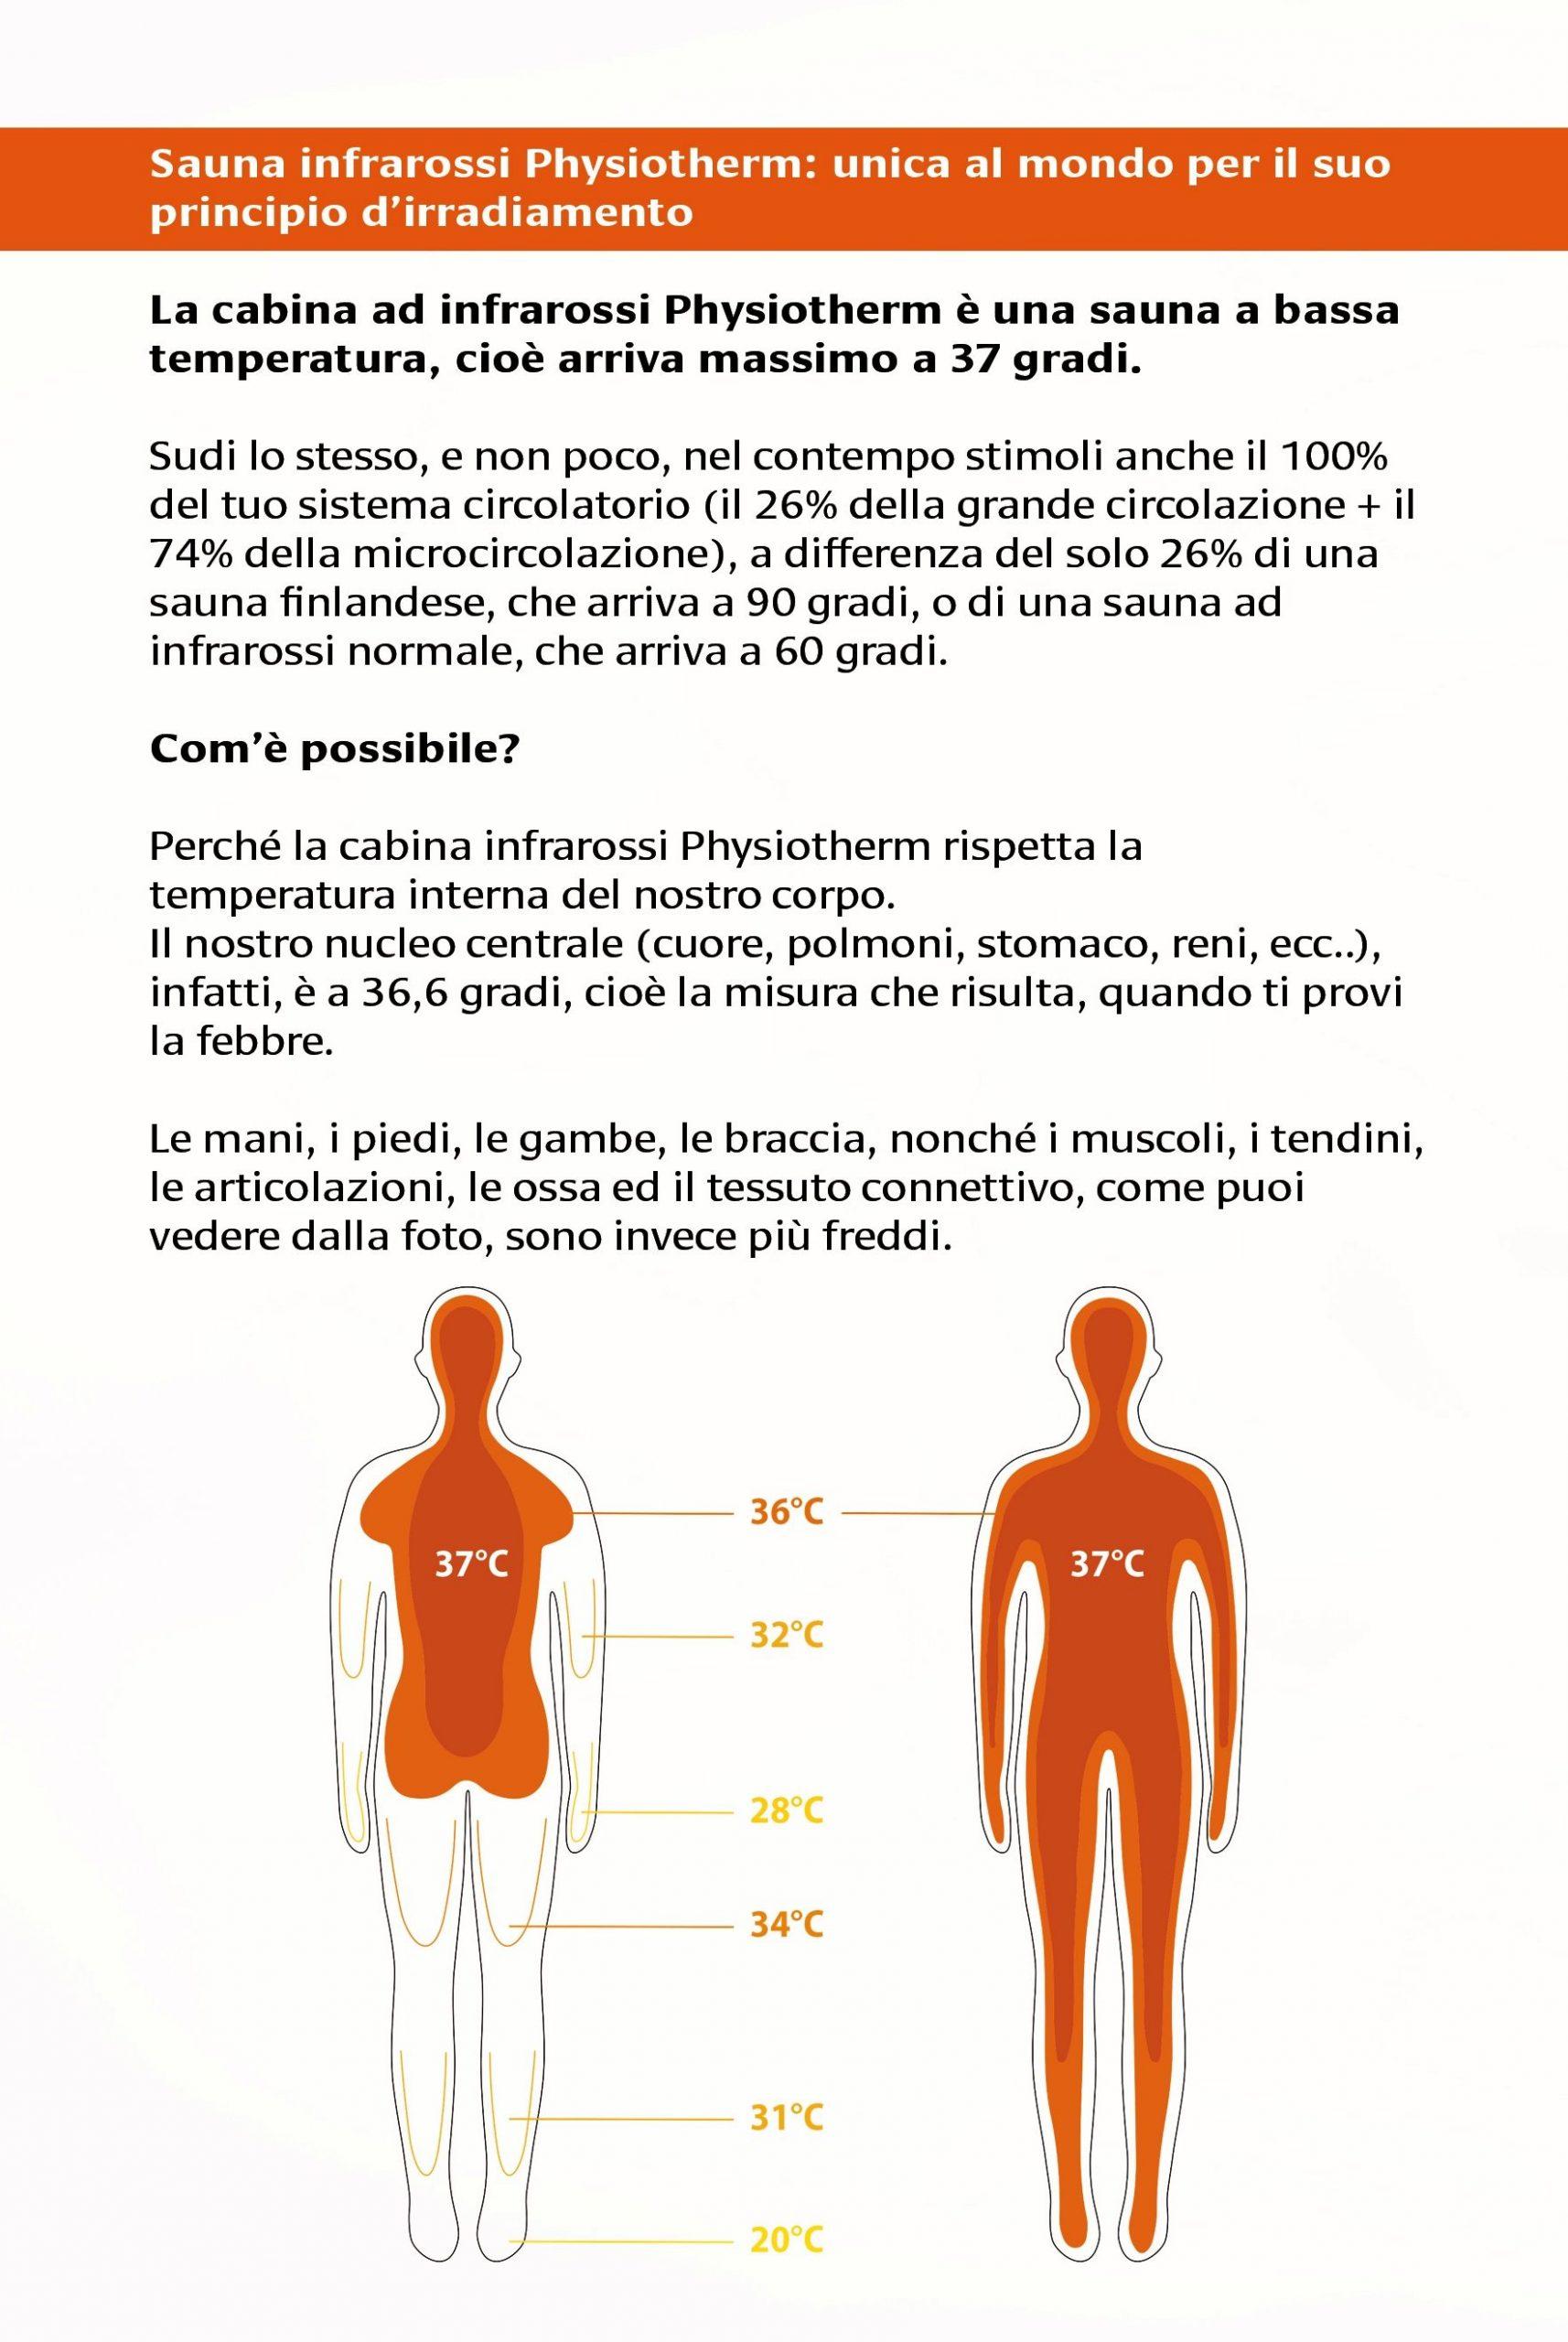 Pag.2 vol Sauna infrarossi Physiotherm Ravenna Gym Effetto Vita